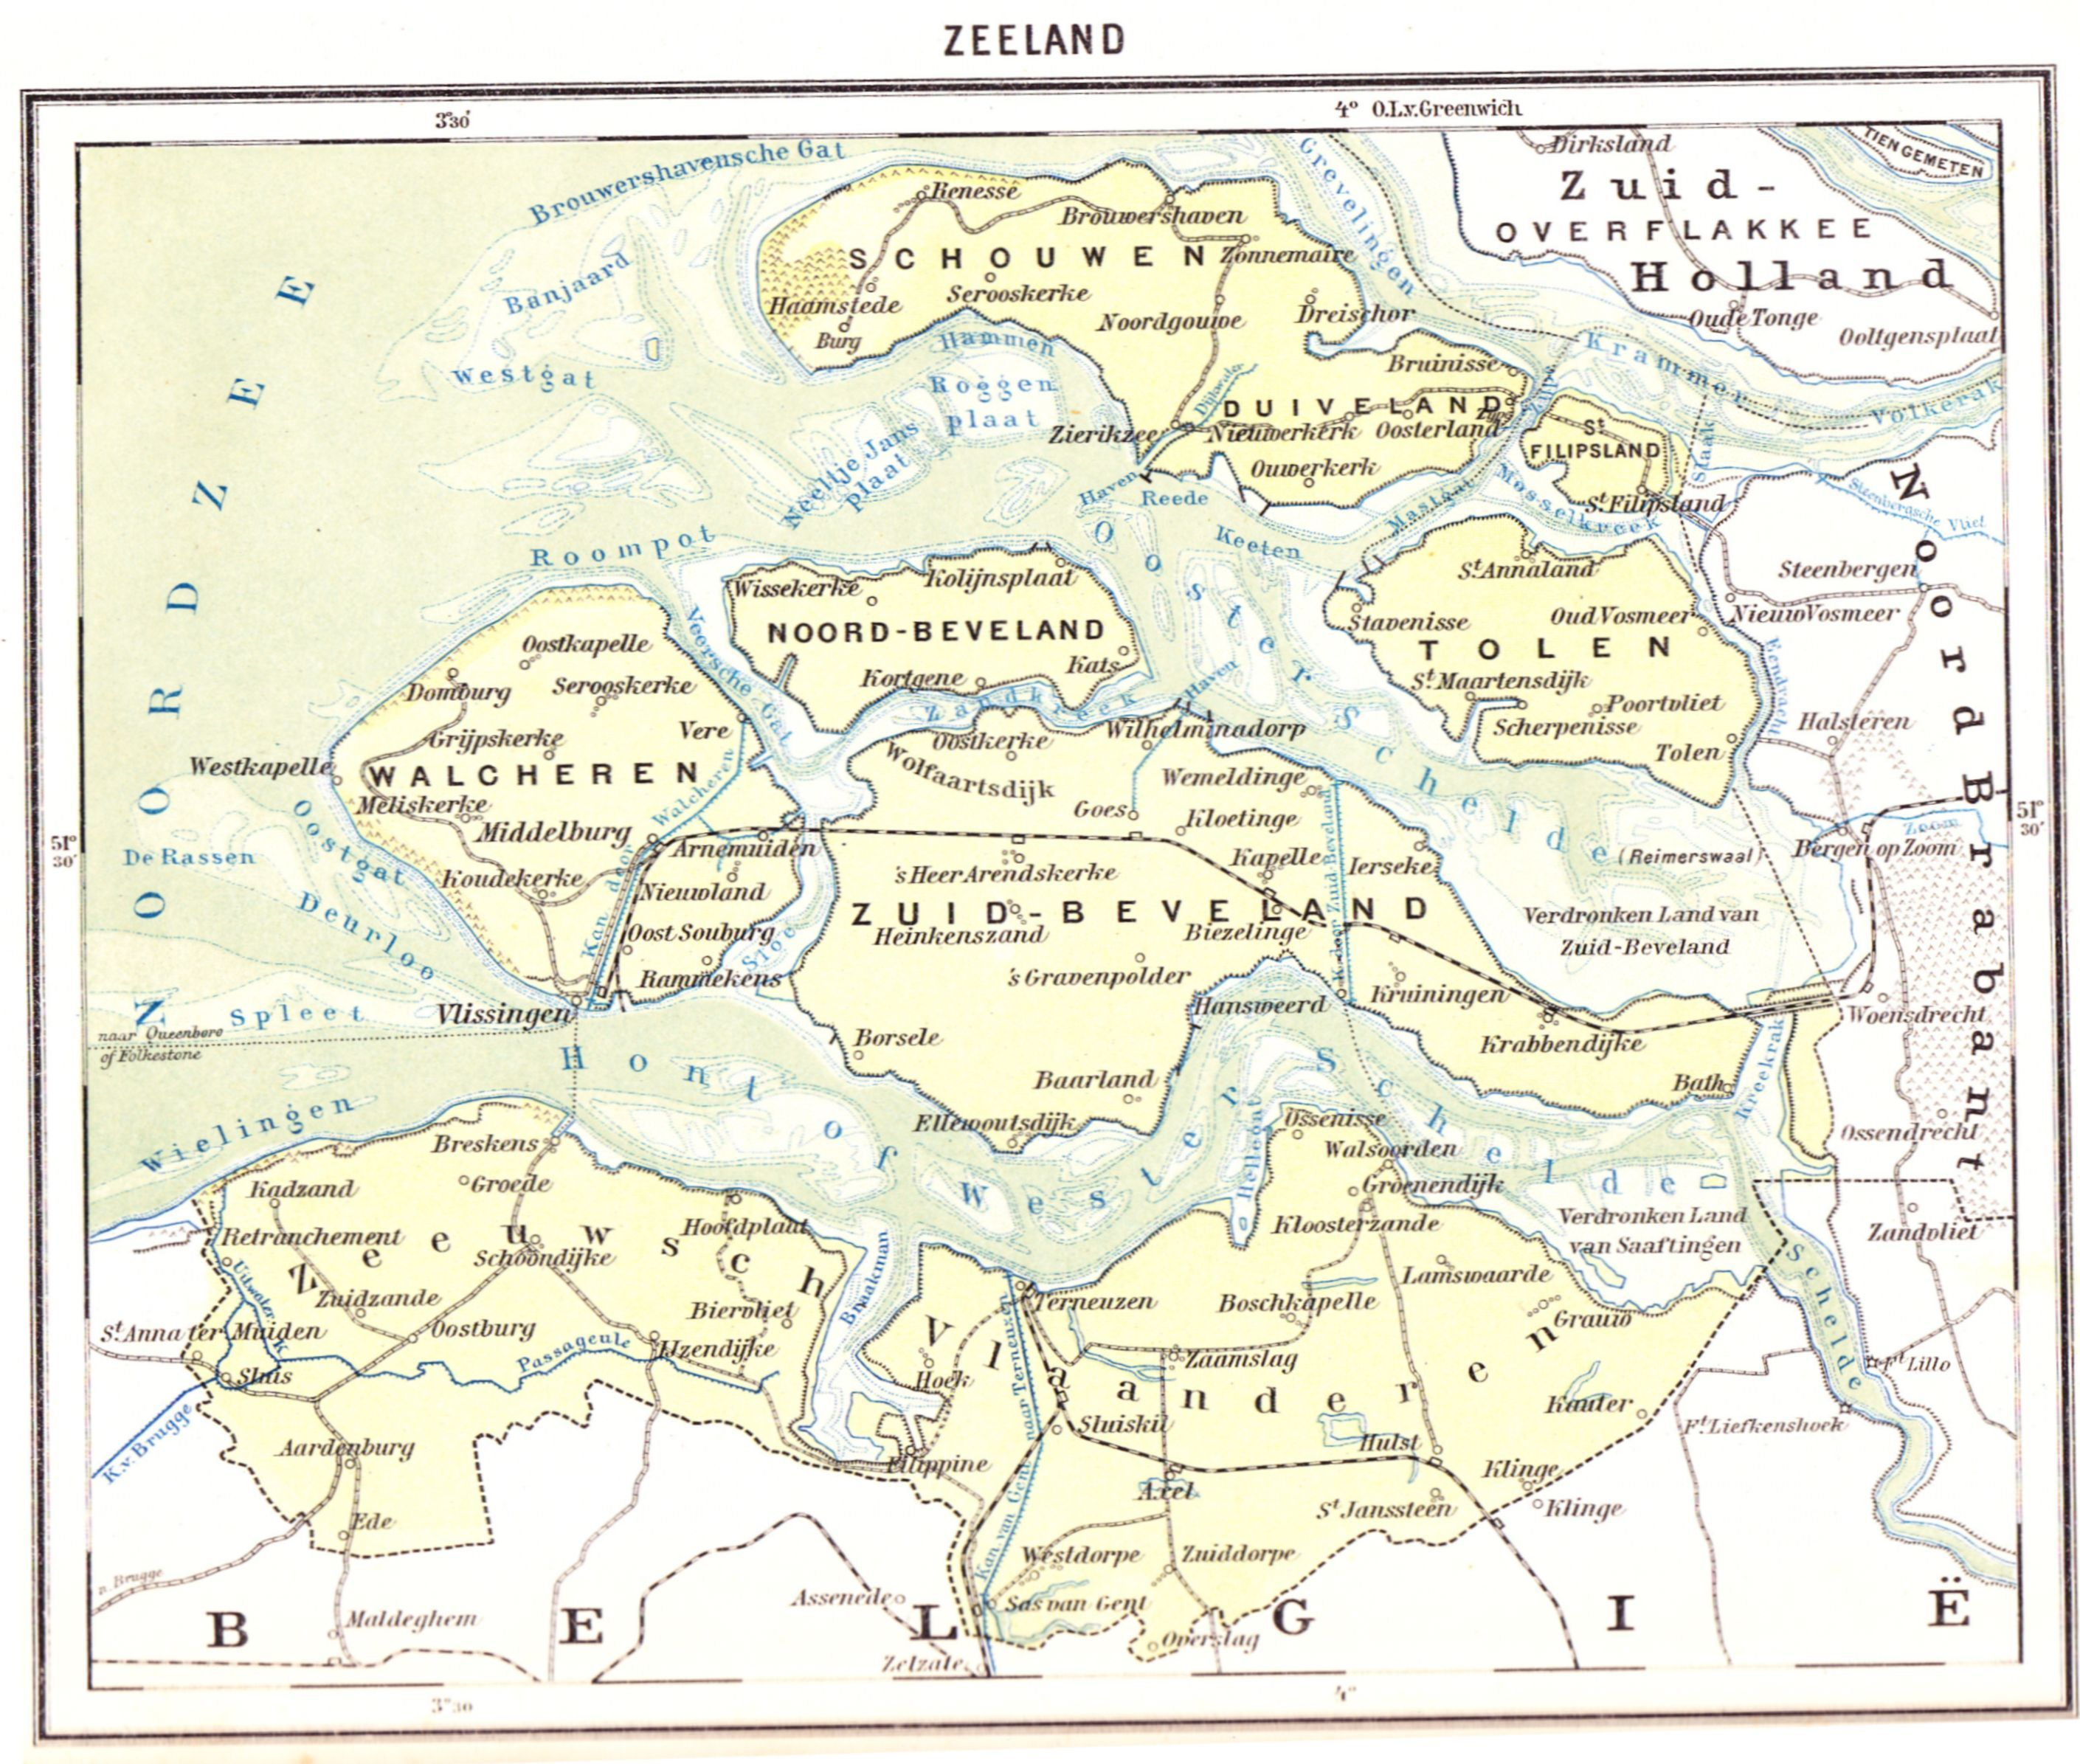 1919 Kleine Bosatlas Wolters-Groningen